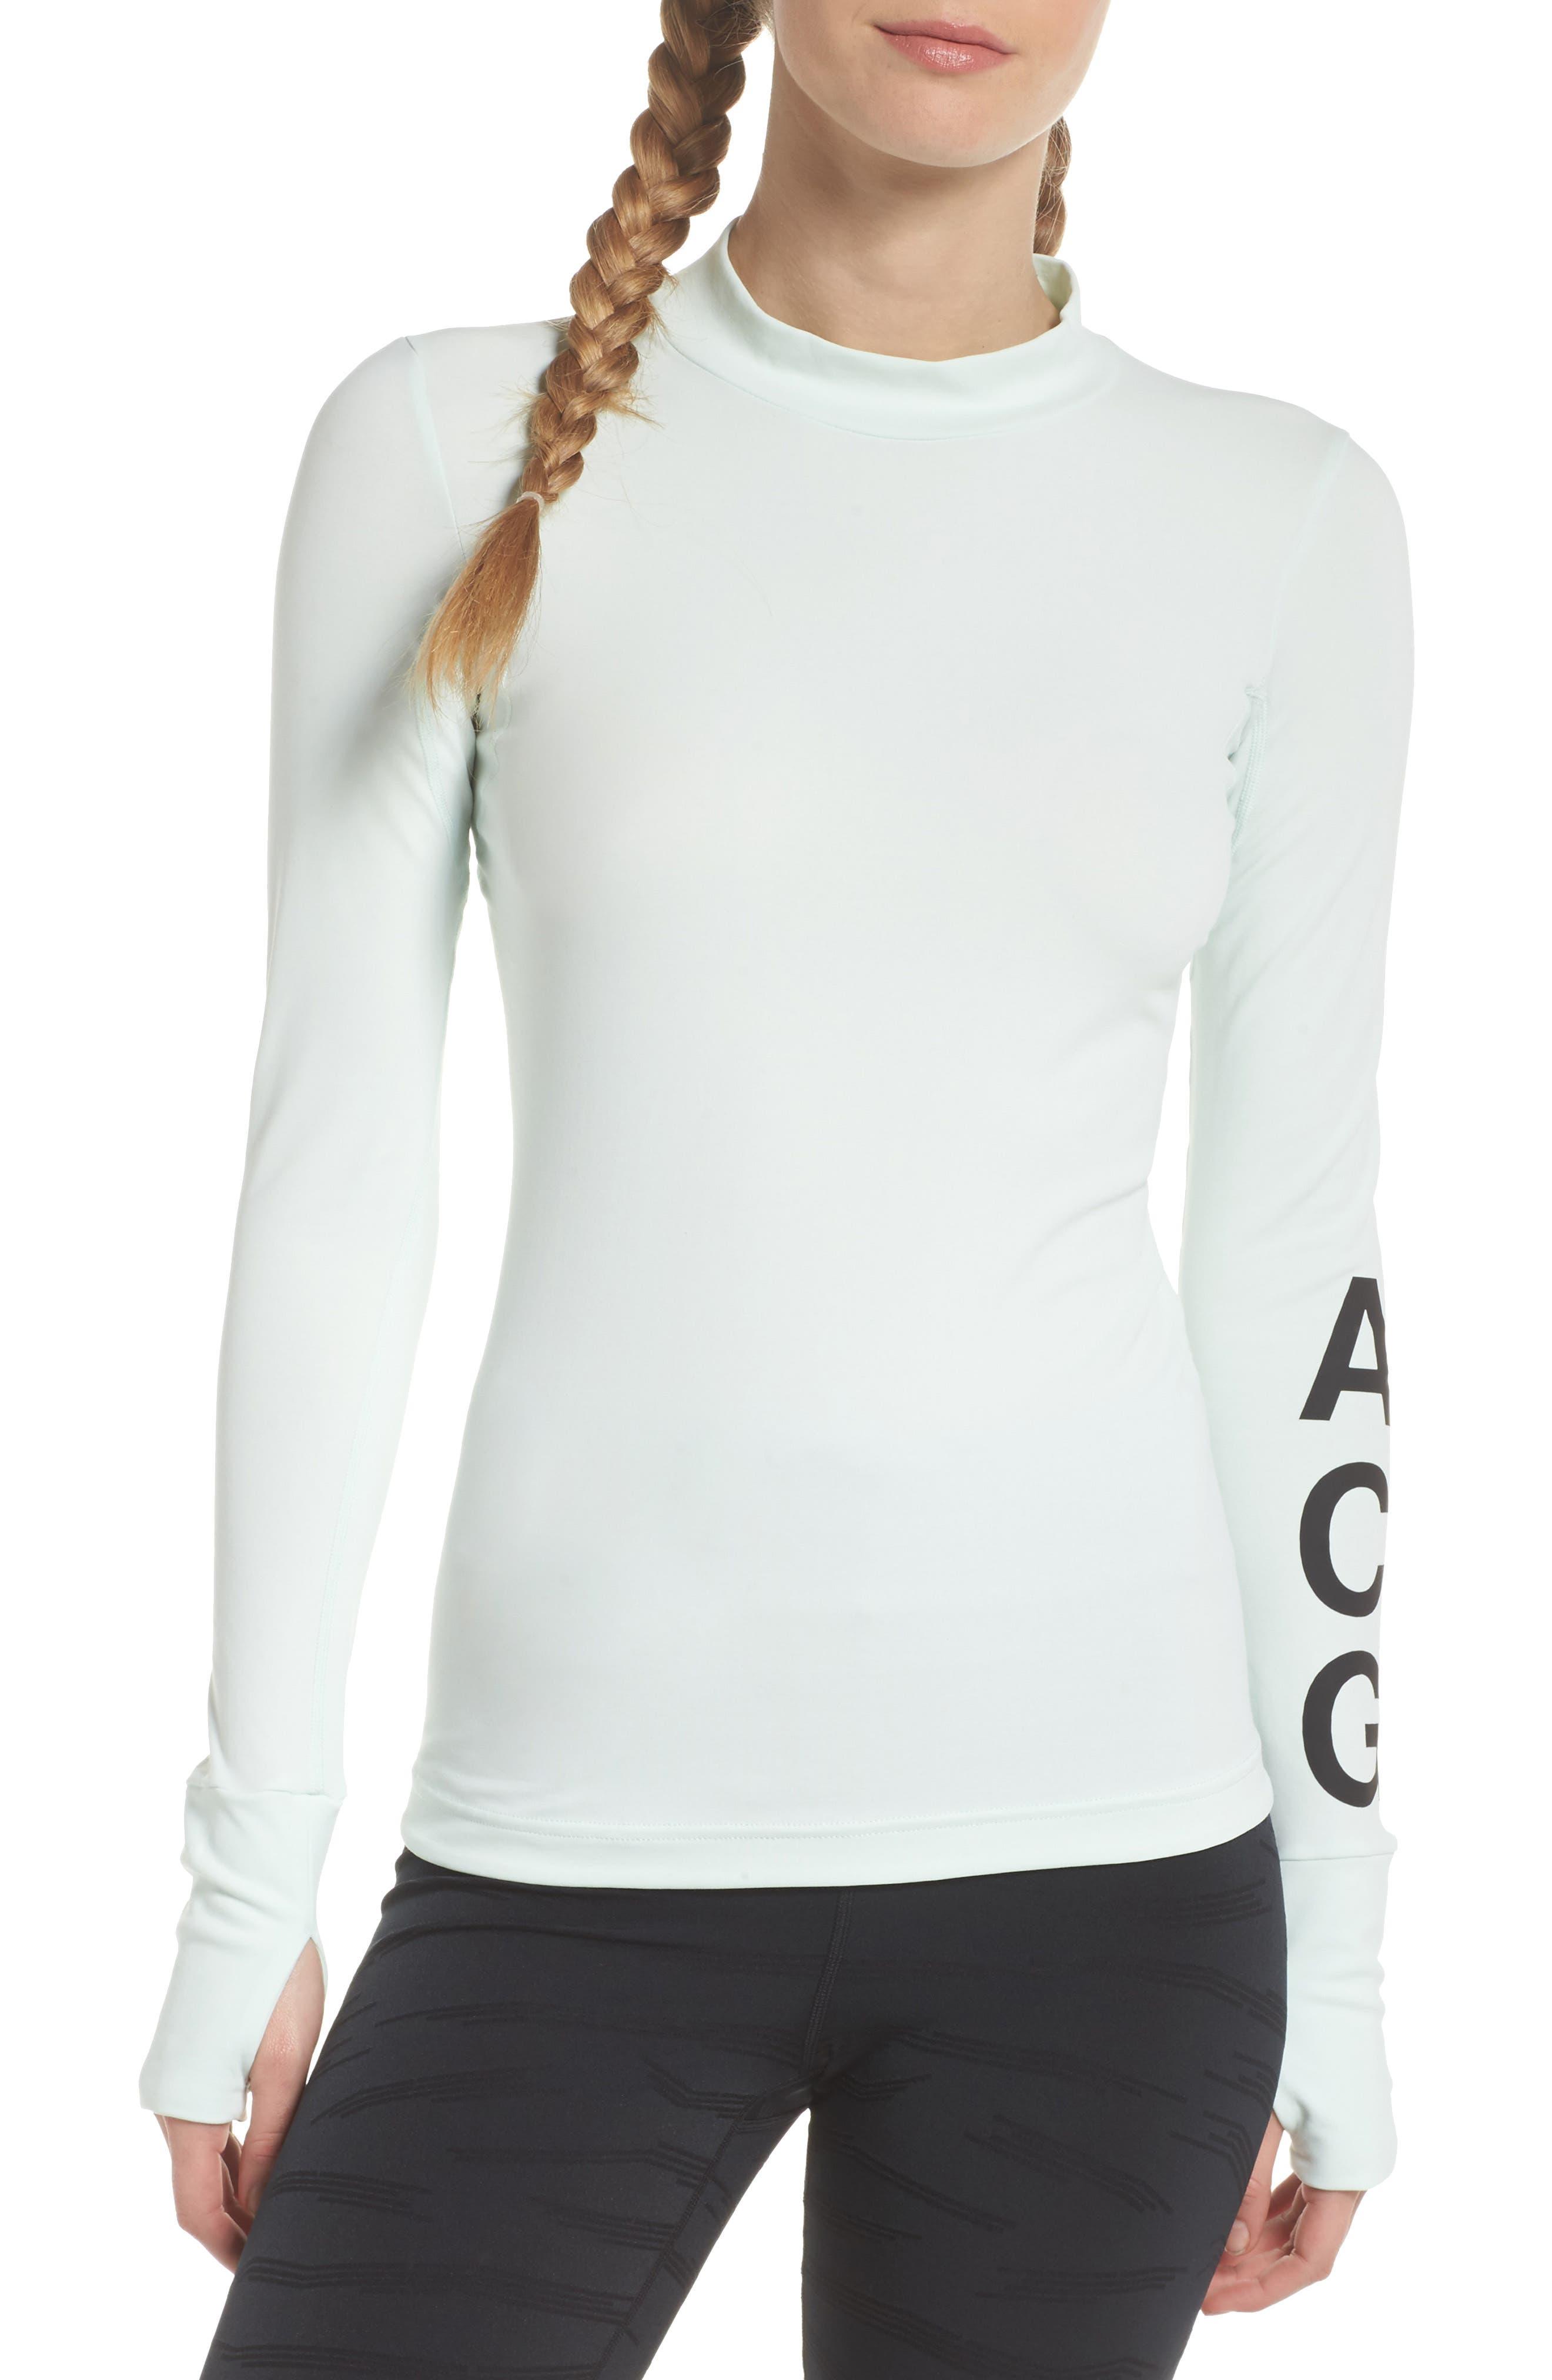 NikeLab ACG Long Sleeve Women's Top,                         Main,                         color, Barely Green/ Black